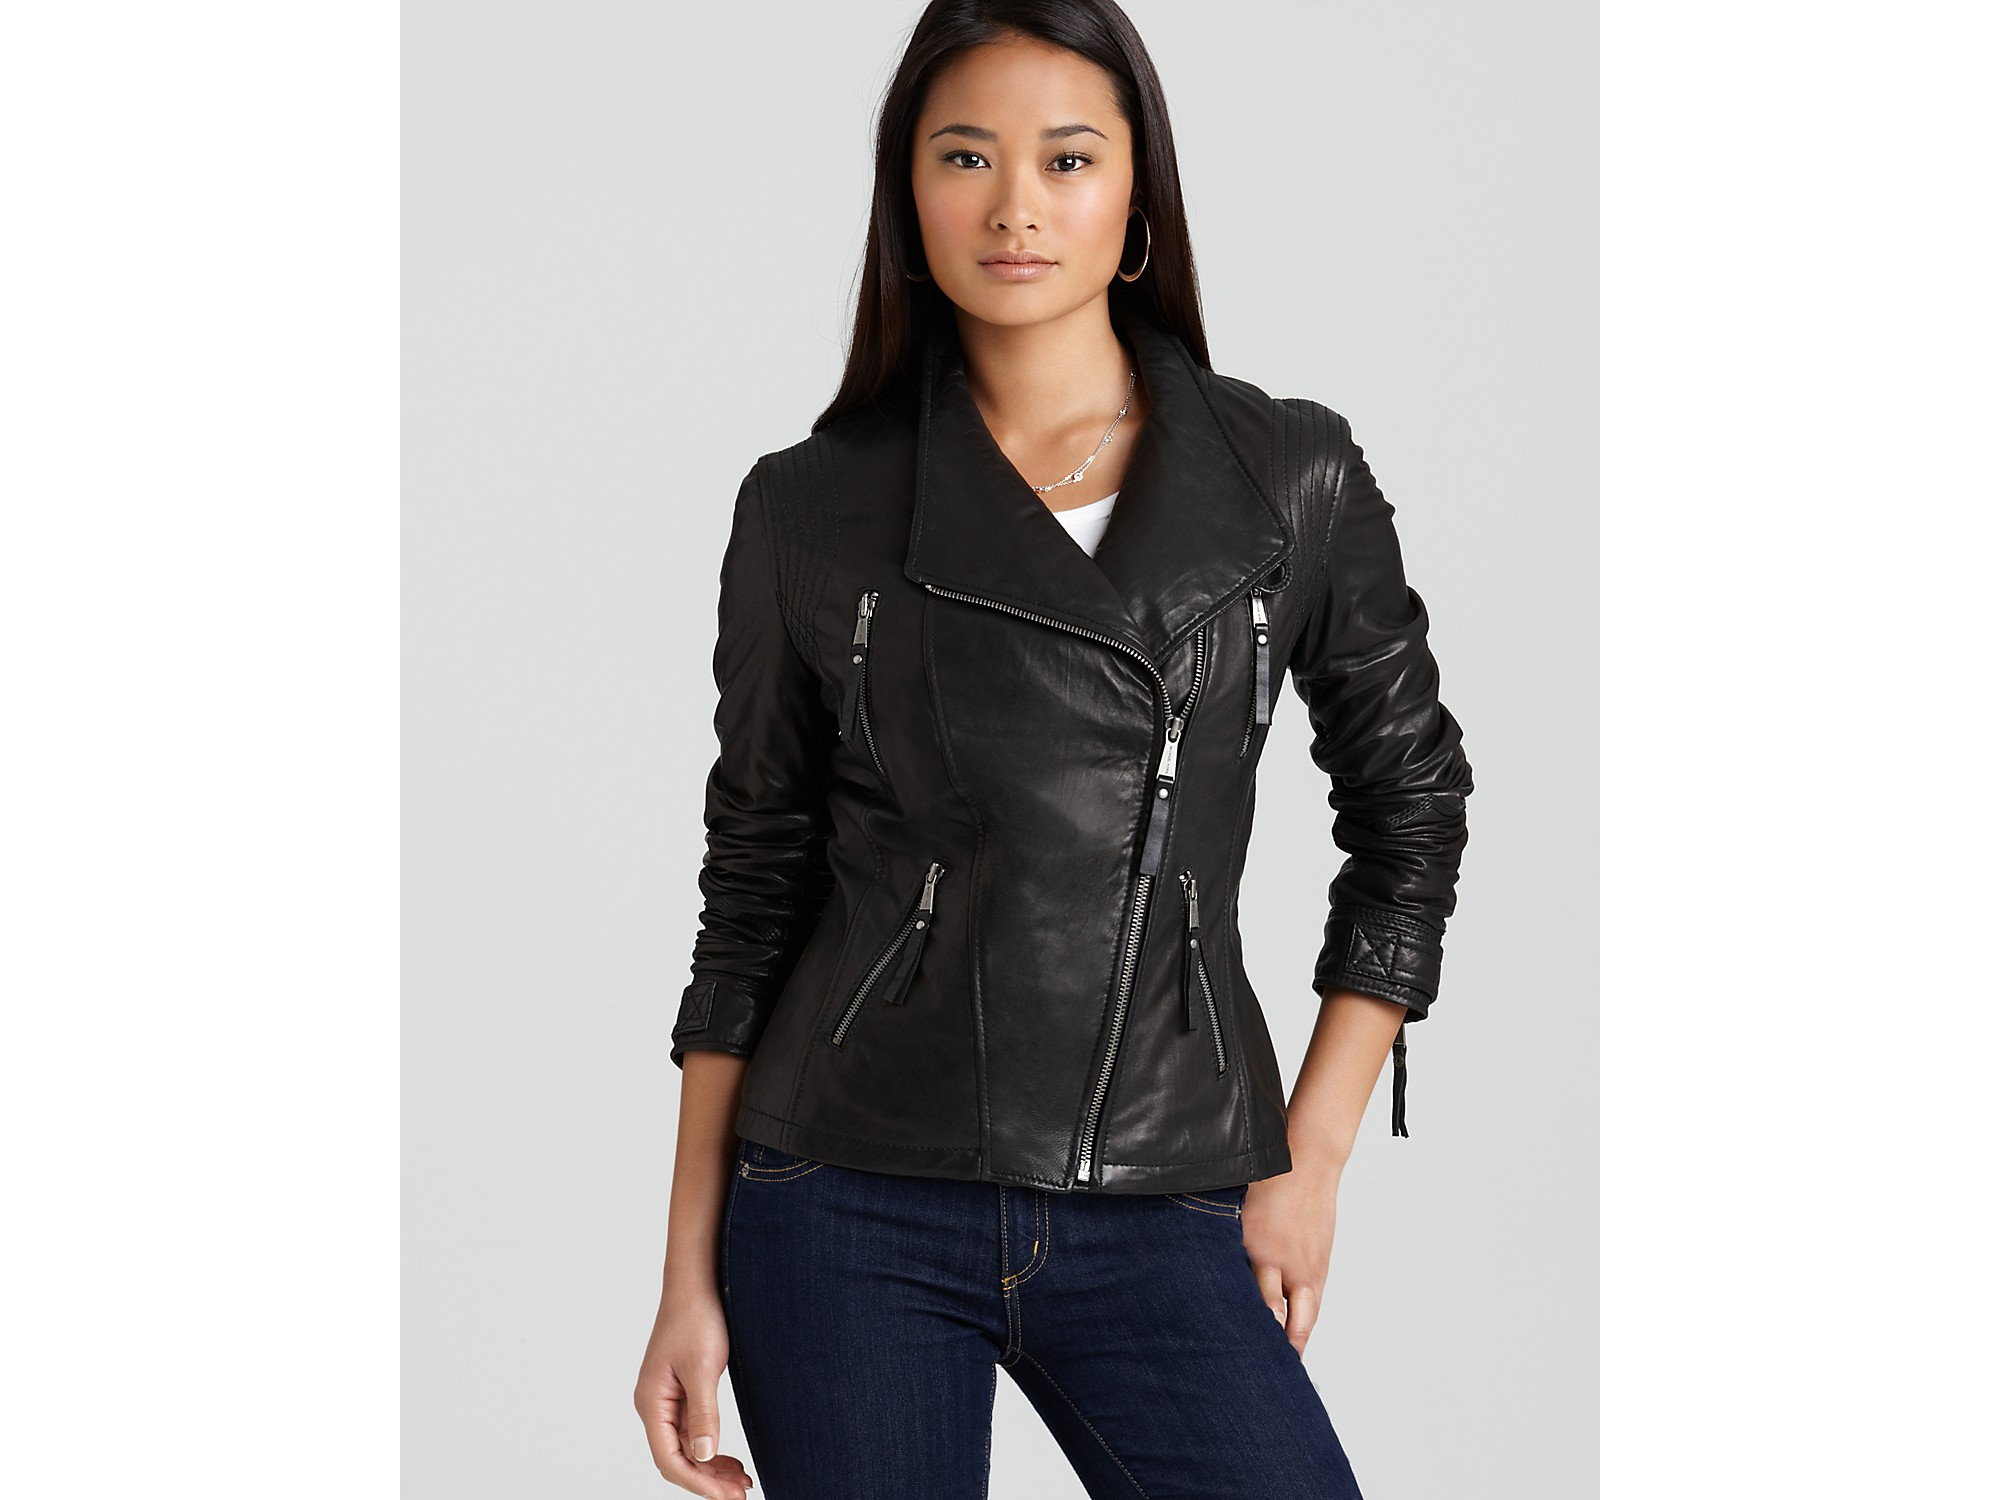 Michaels kors leather jacket